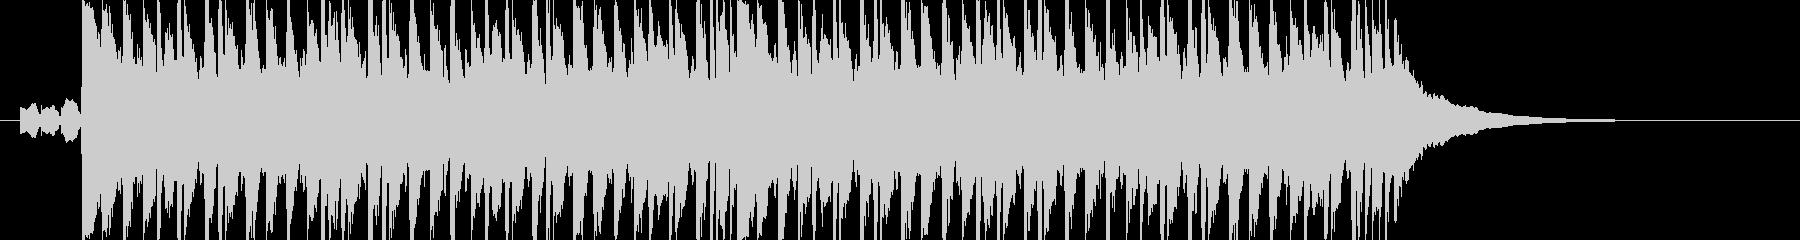 CMや映像、ハッピーなウクレレ、口笛2bの未再生の波形